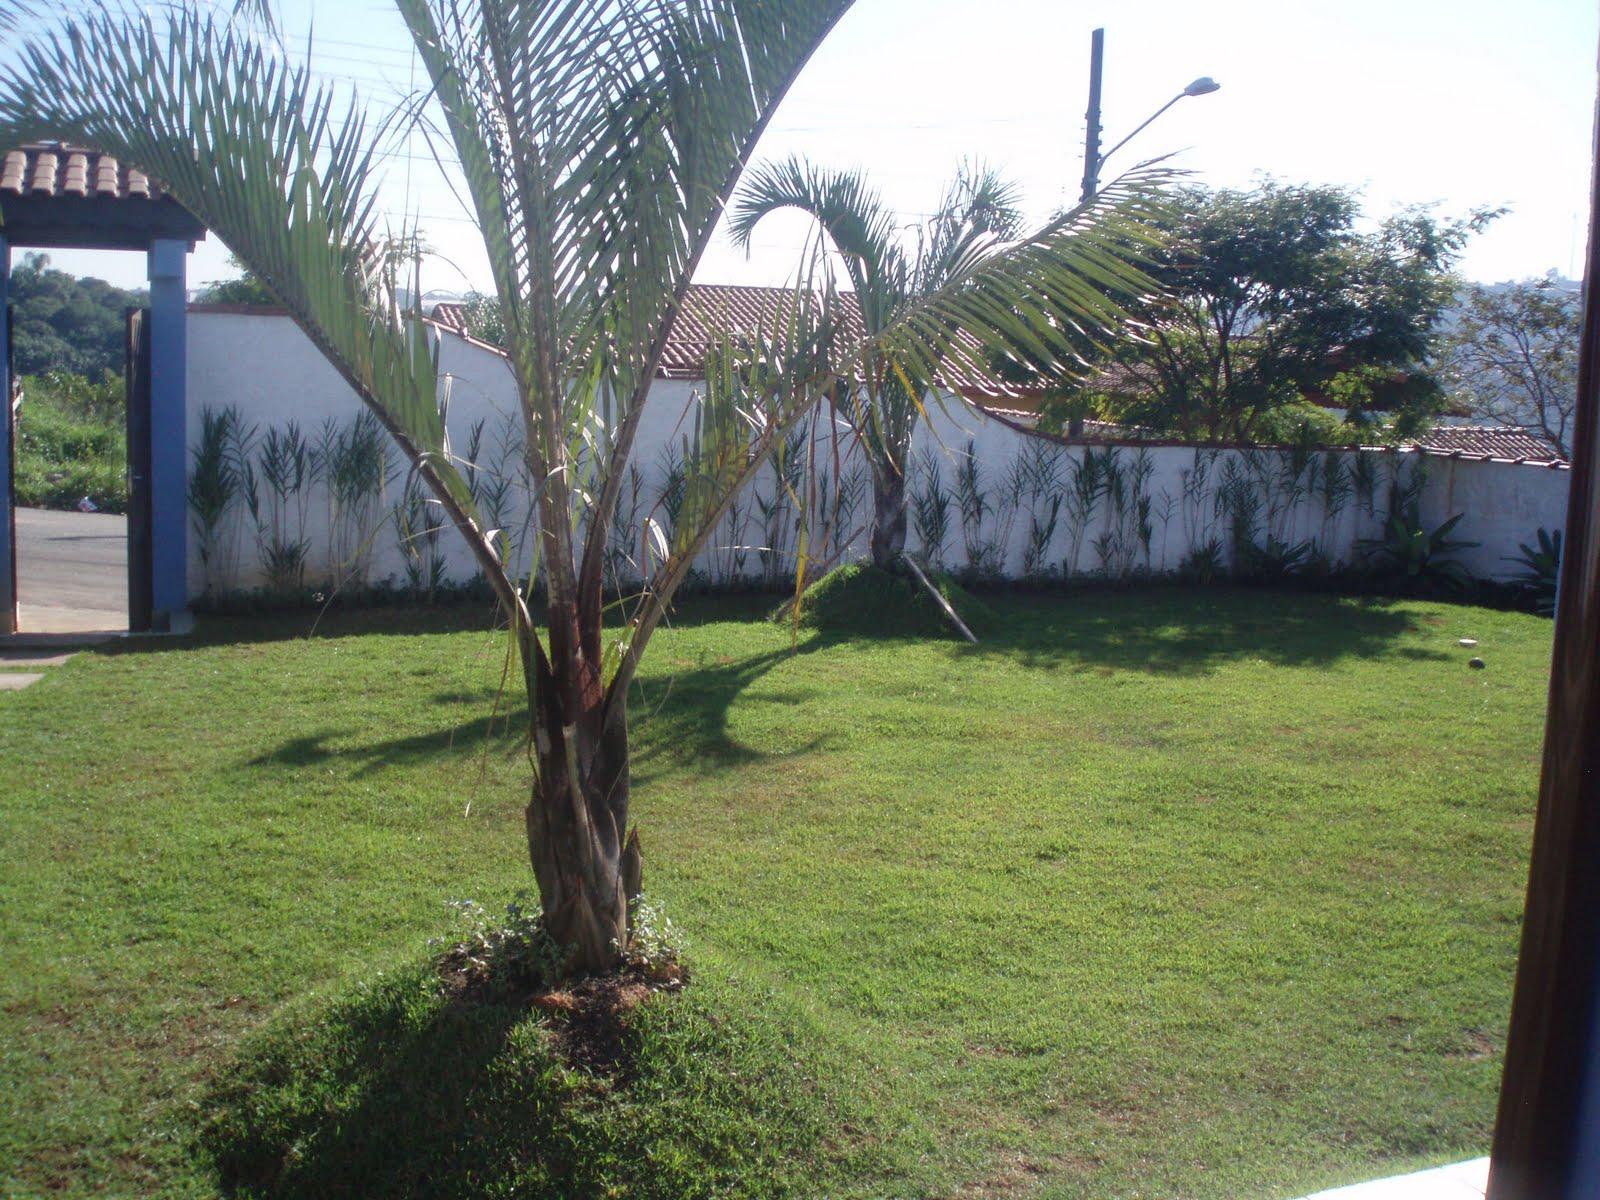 cerca de jardim barata : cerca de jardim barata:Riviera Green Garden: Jardins ,cerca viva,vasos decorados